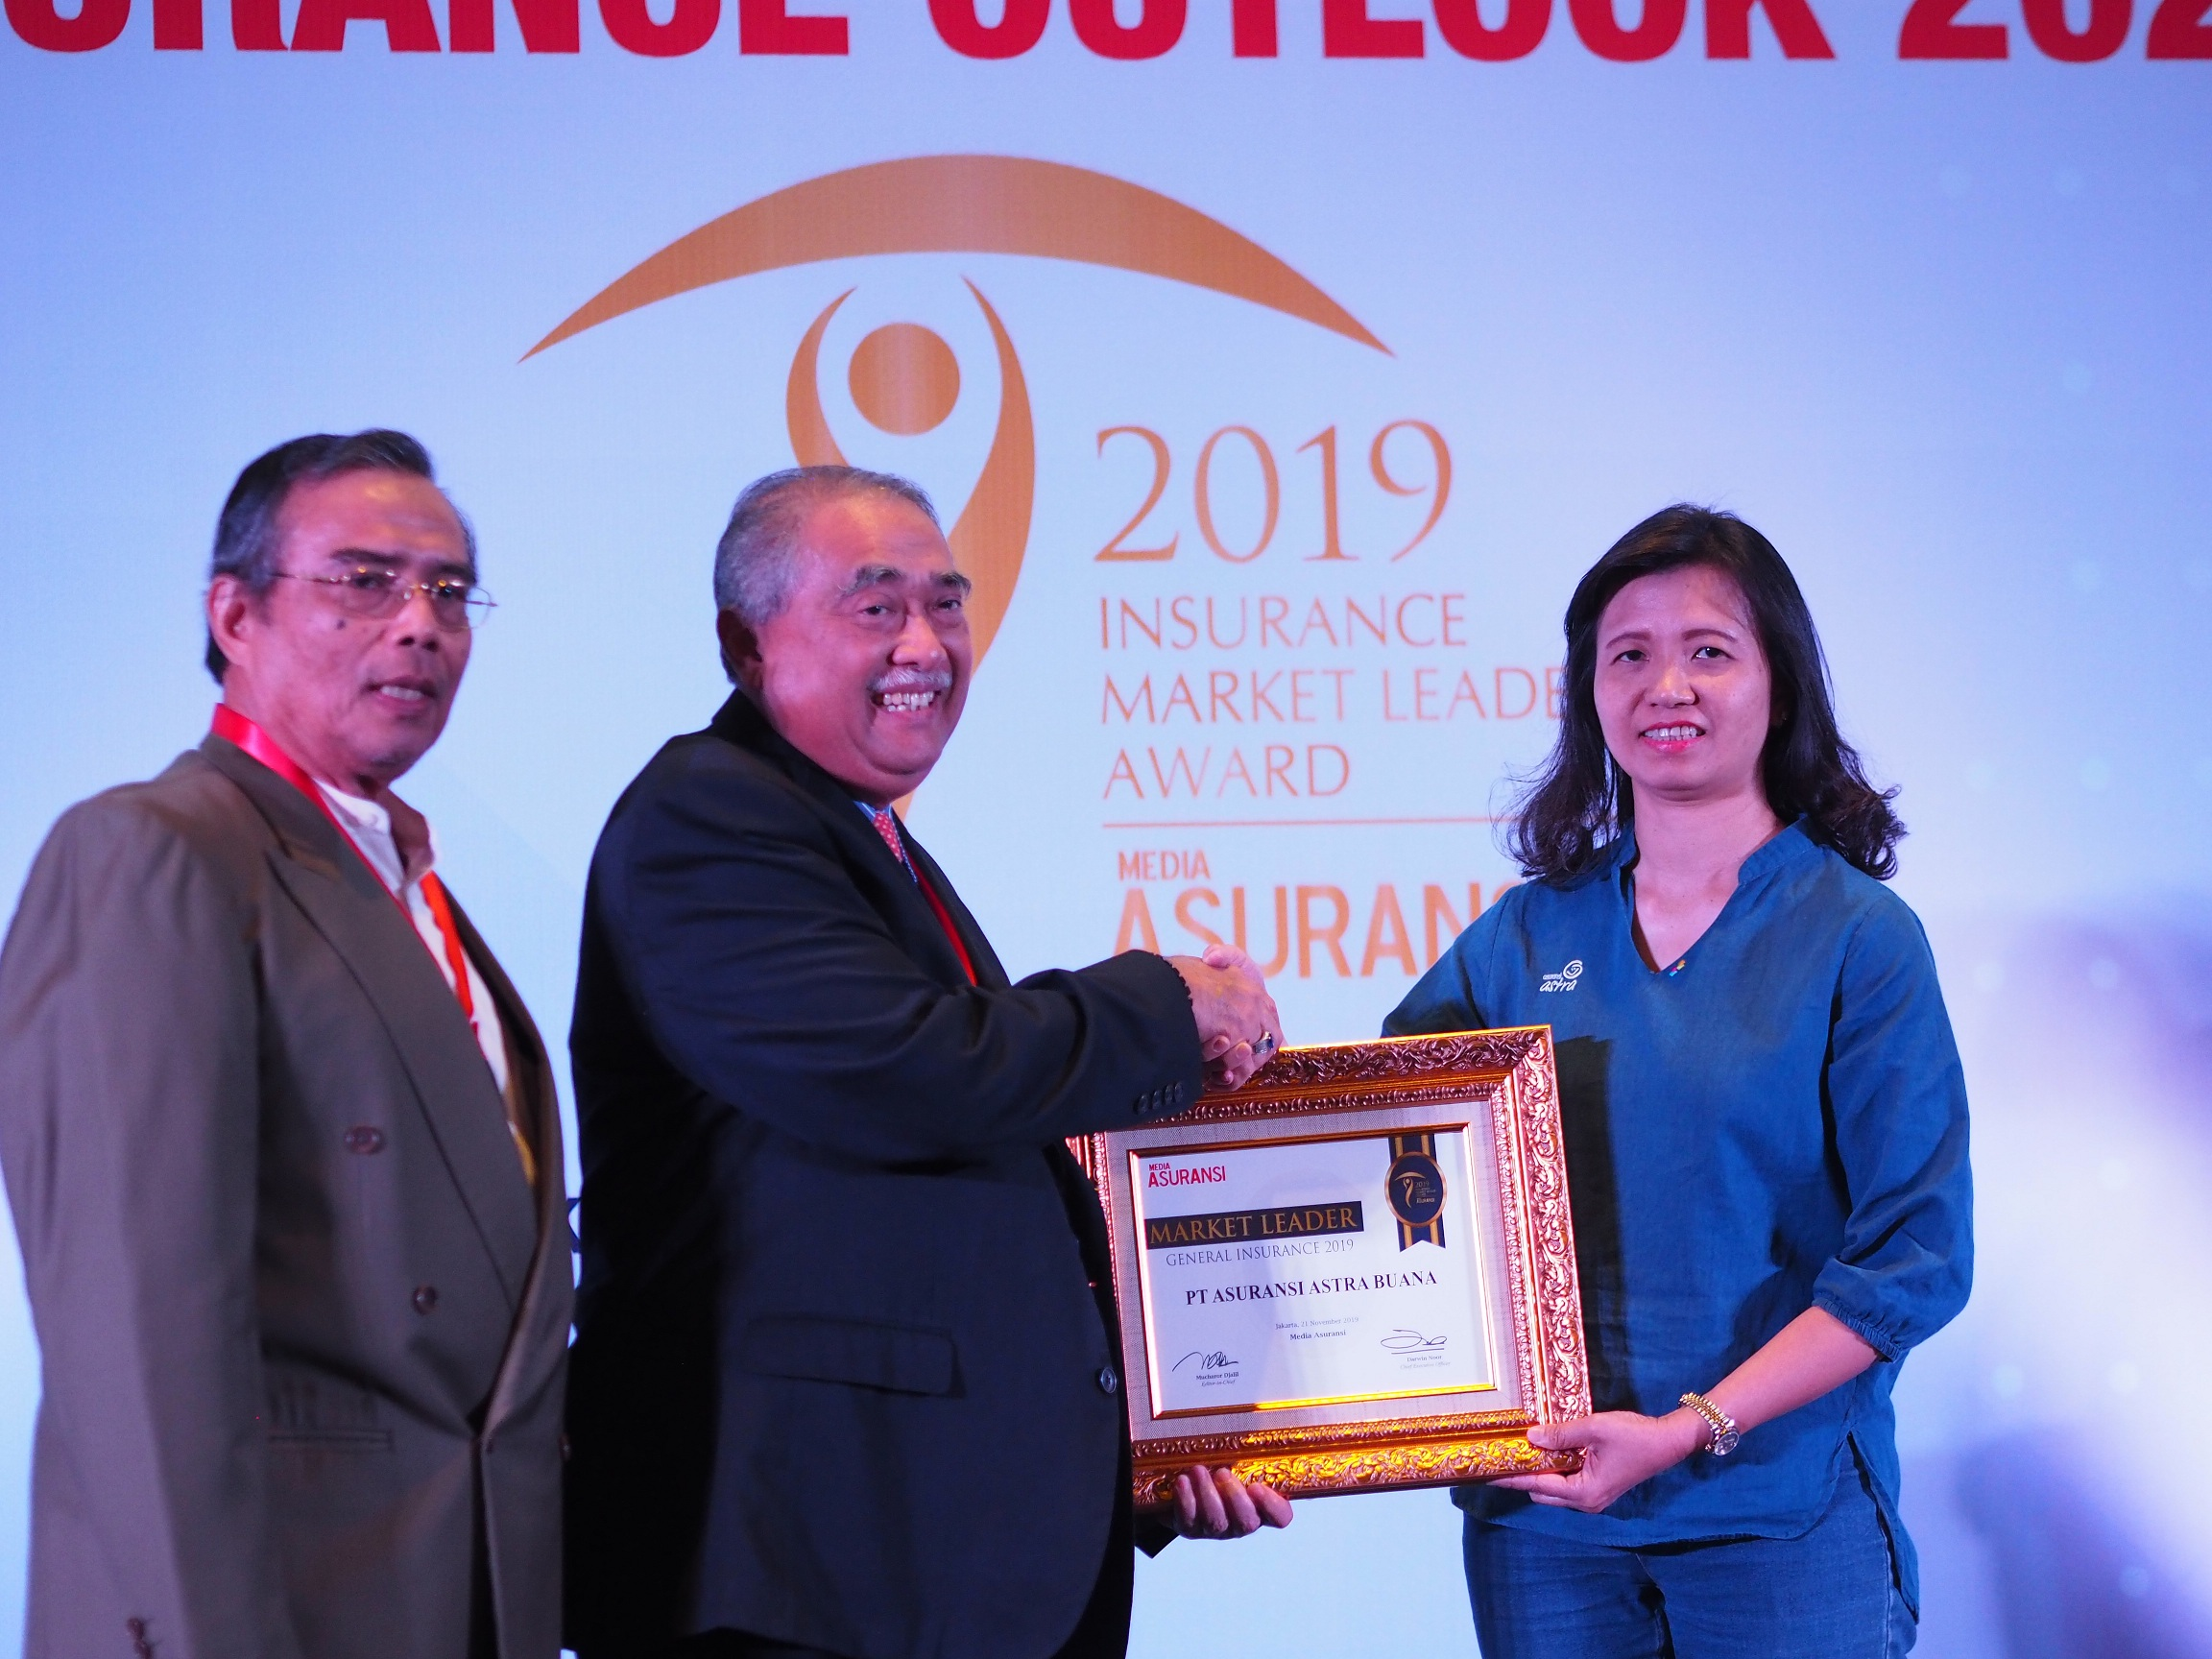 SVP Accounting & Finance Asuransi Astra, Lia Singgih (kanan) saat menerima penghargaan